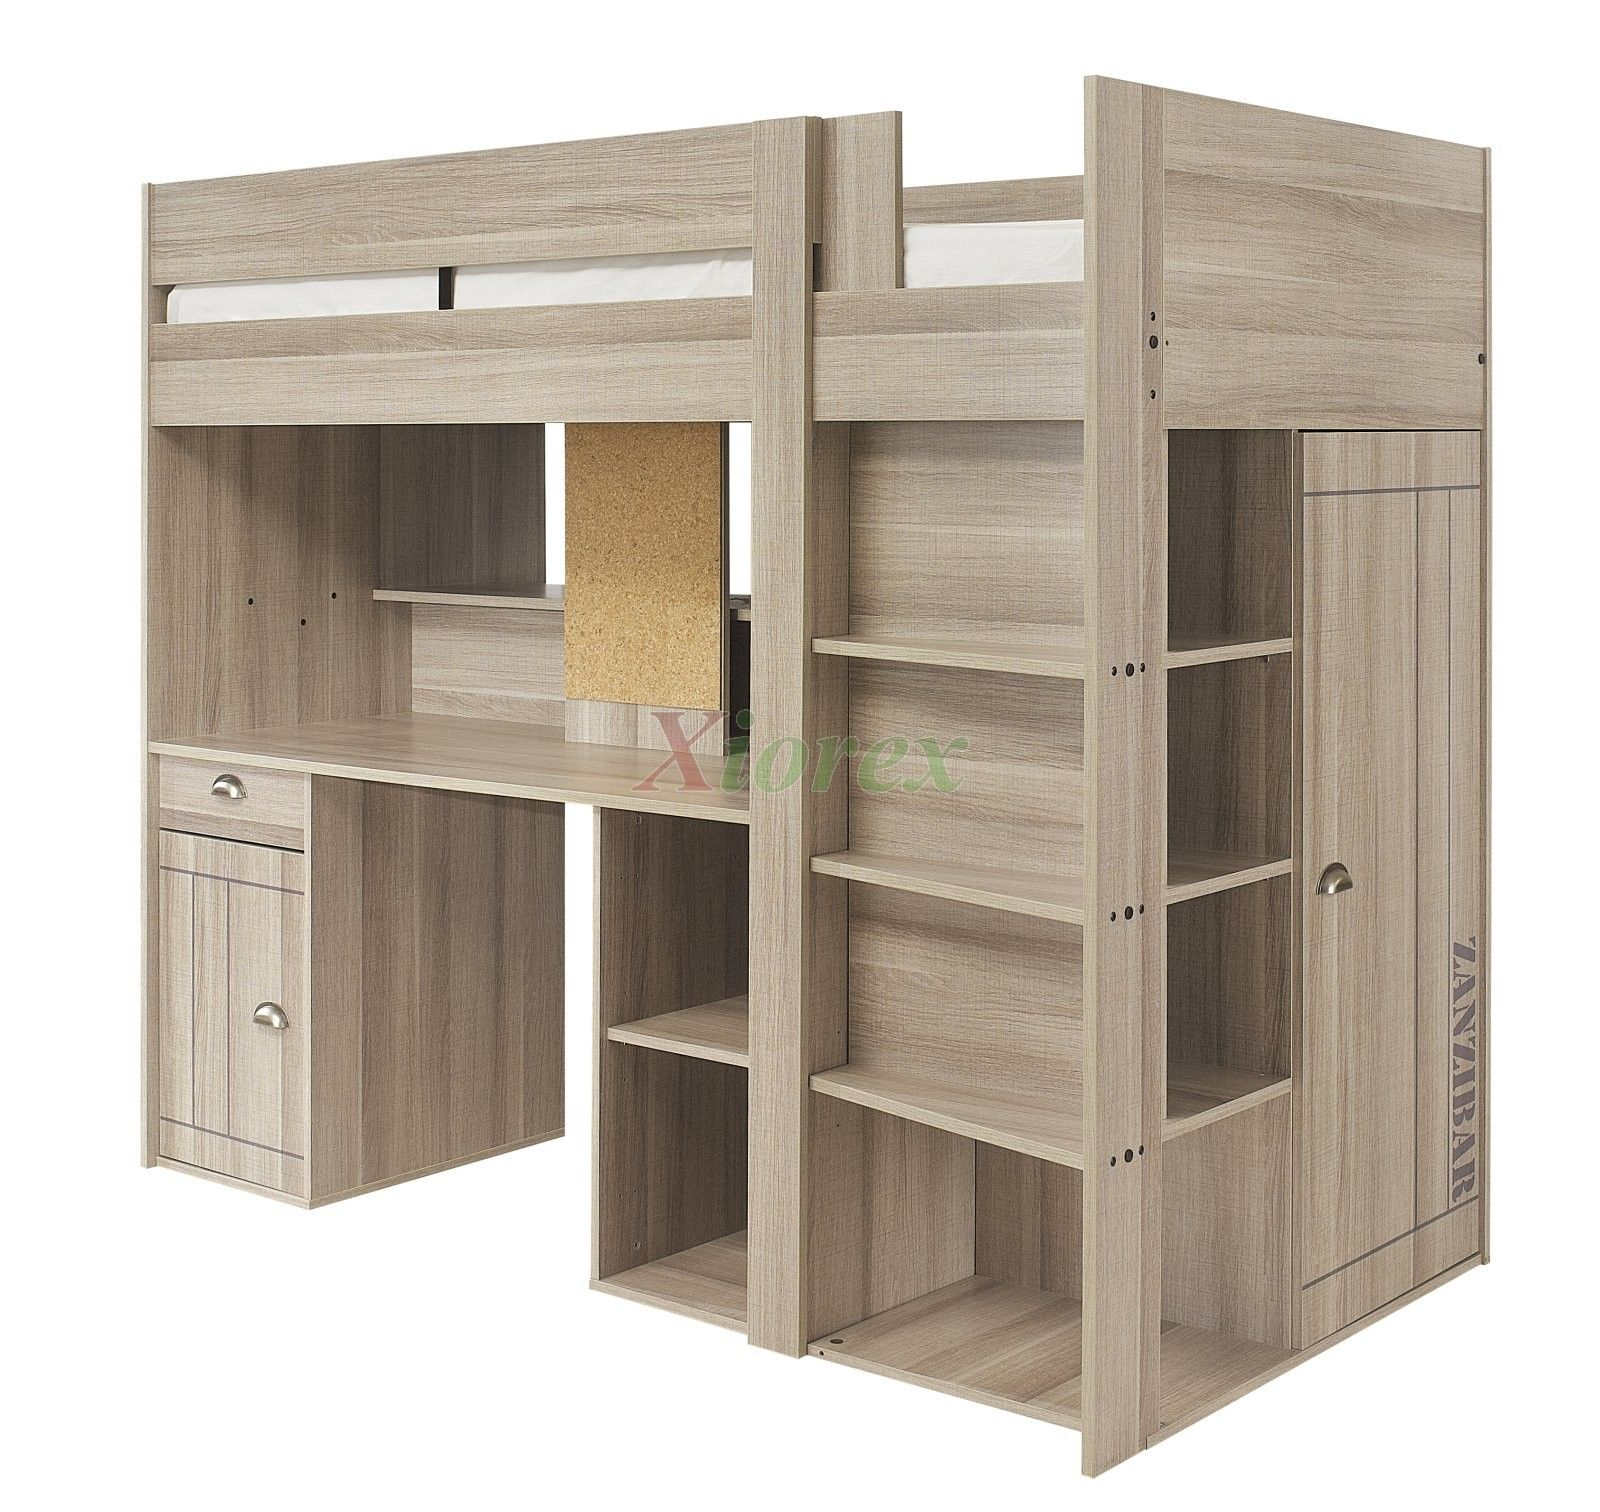 loft bed with closet underneath plans diy blueprint plans download screen door plans diy lofts room and bedrooms